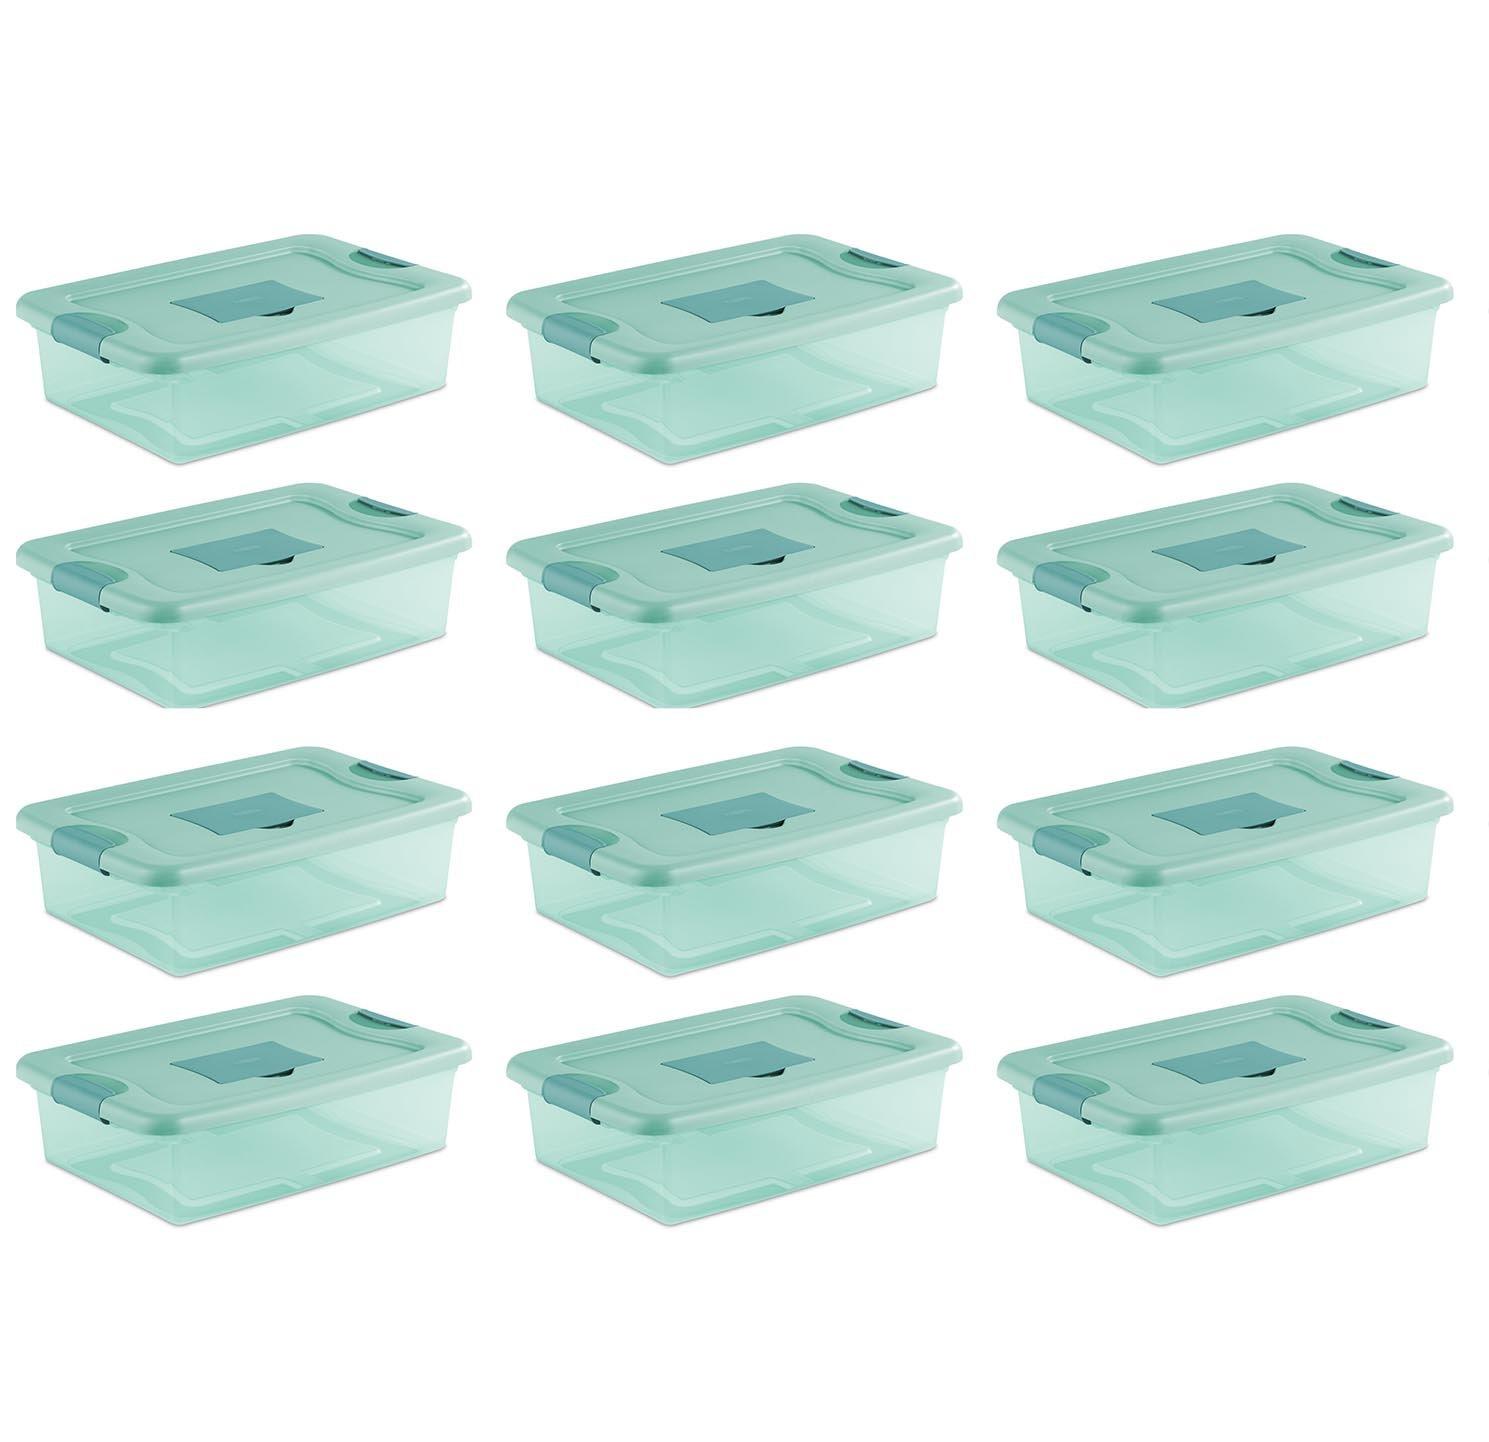 Sterilite 32 Quart Fresh Scent Stackable Plastic Storage Box Container (12 Pack)